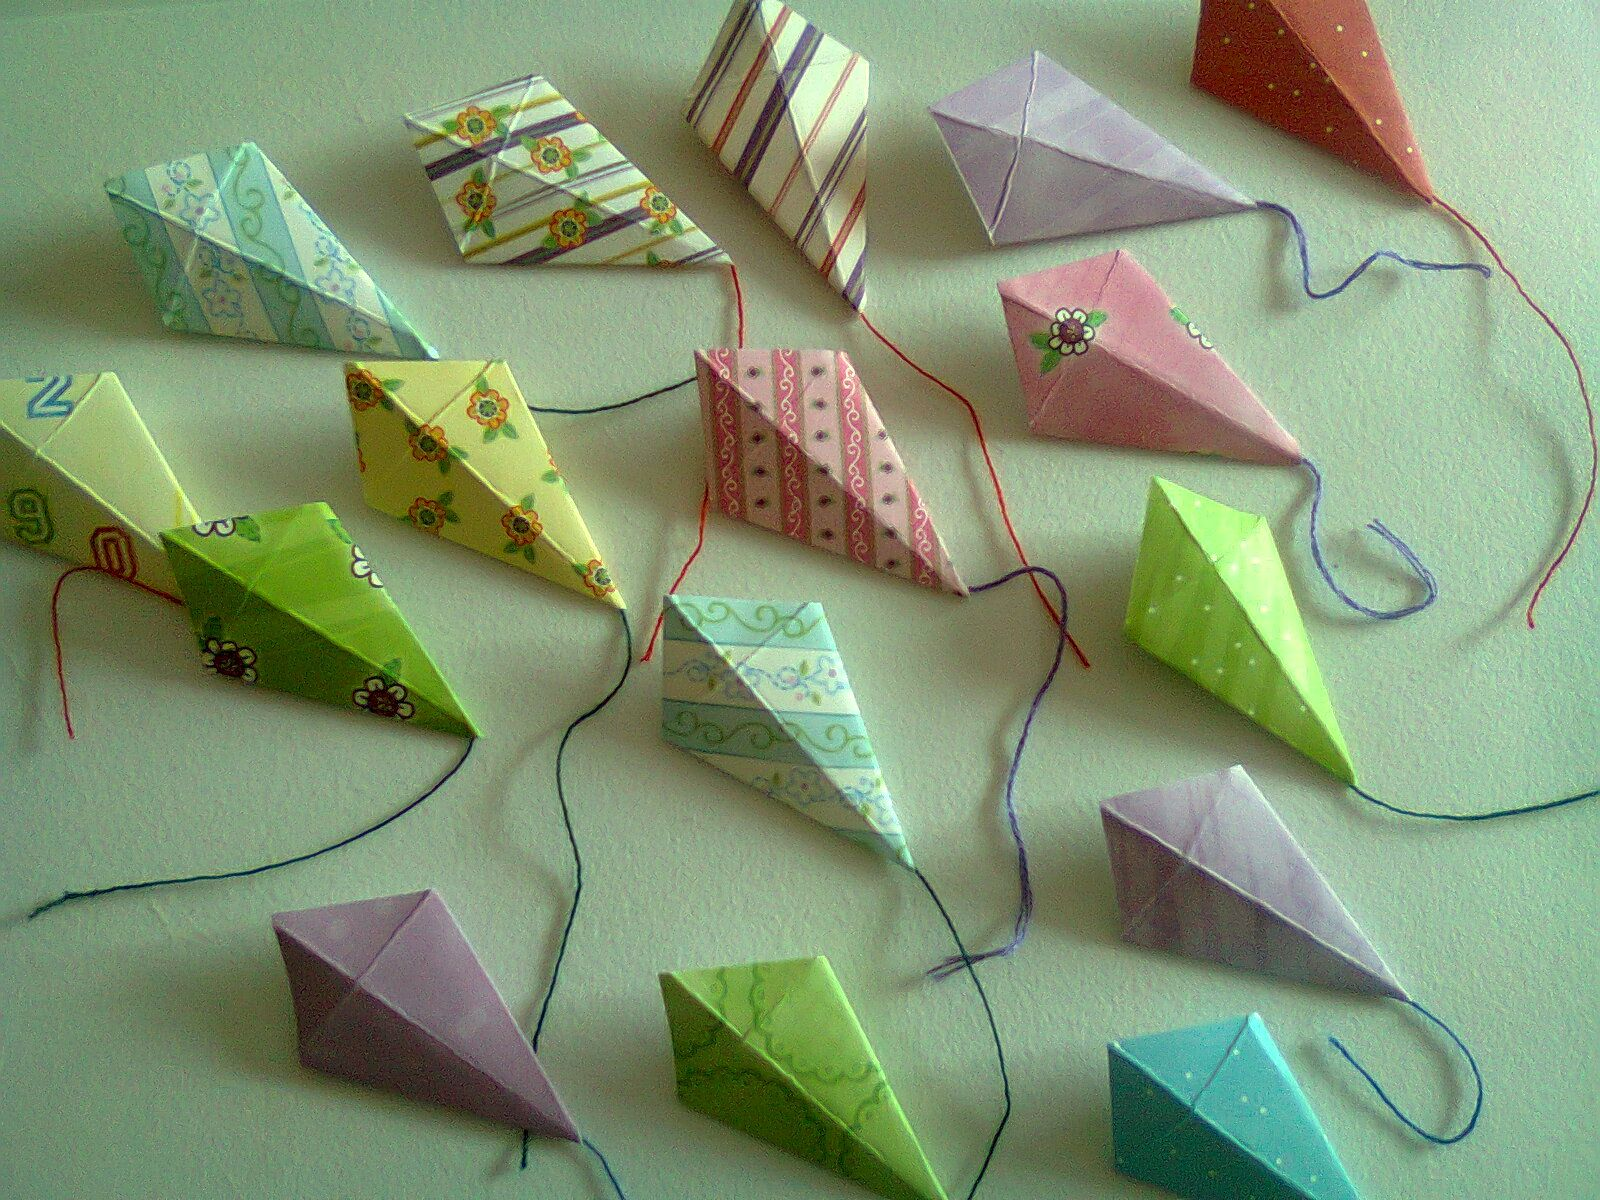 Origami Kite Kite Party Decorations